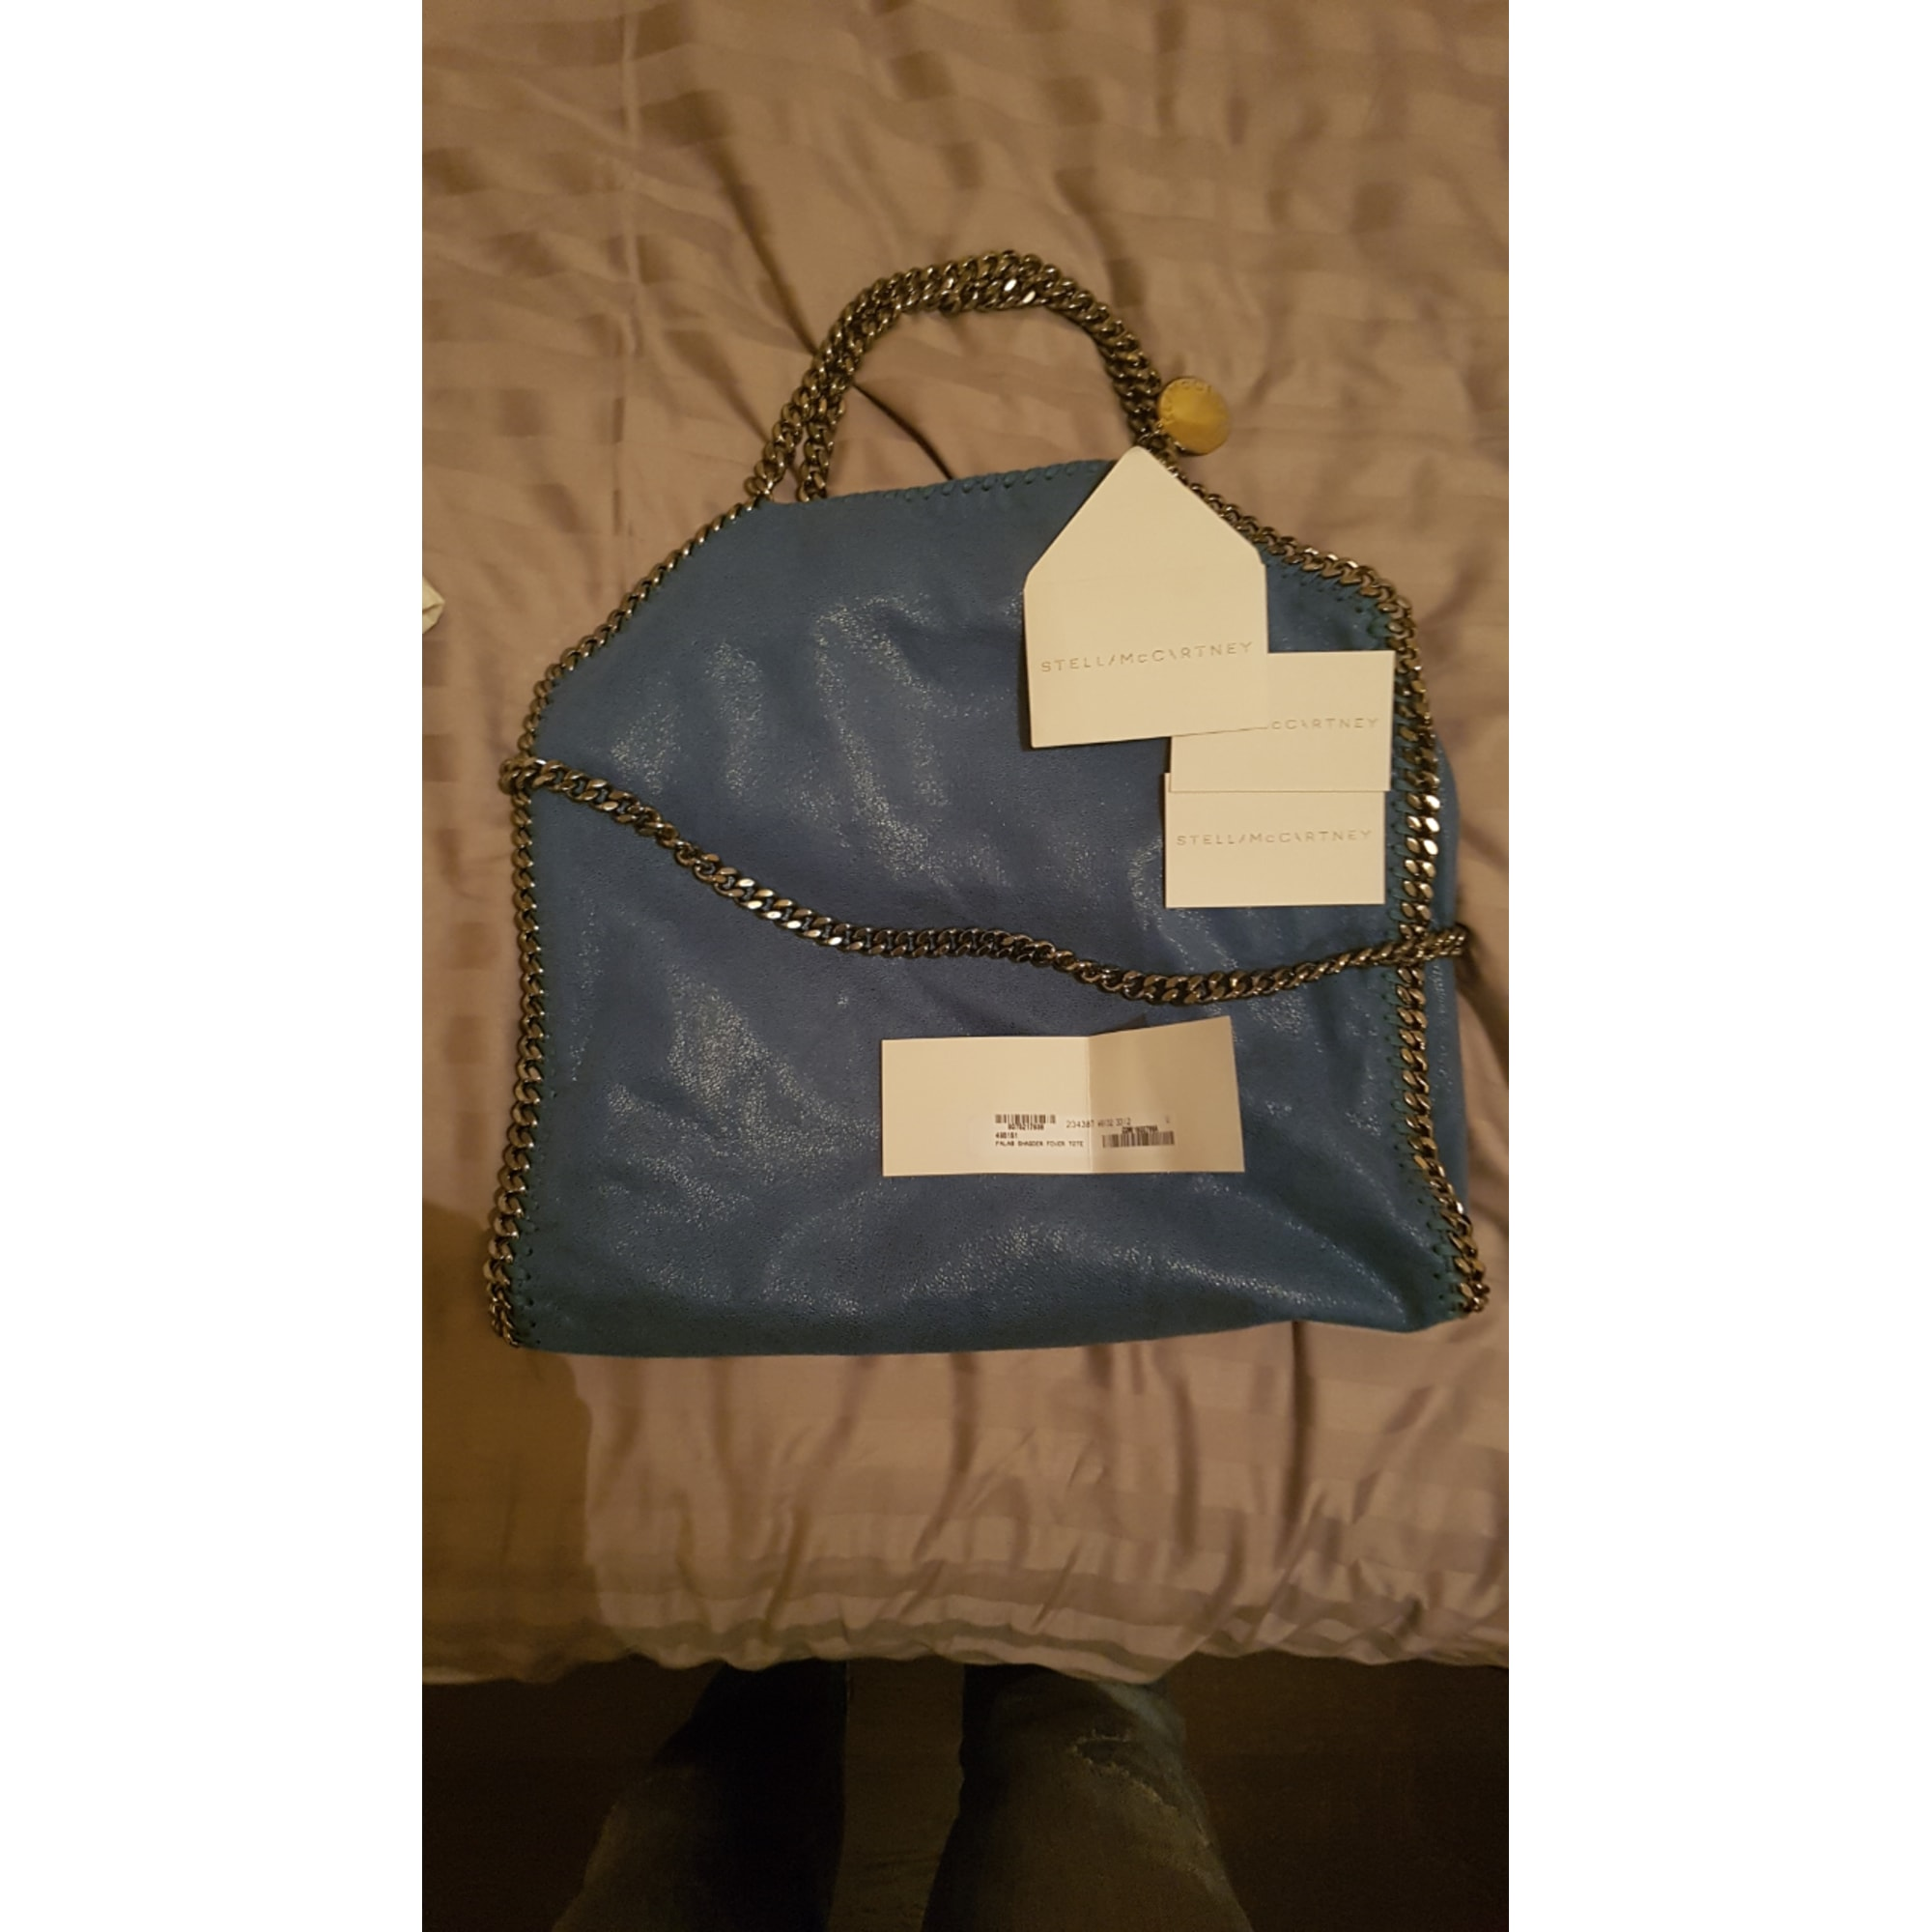 Sac à main en cuir STELLA MCCARTNEY Falabella Bleu, bleu marine, bleu turquoise